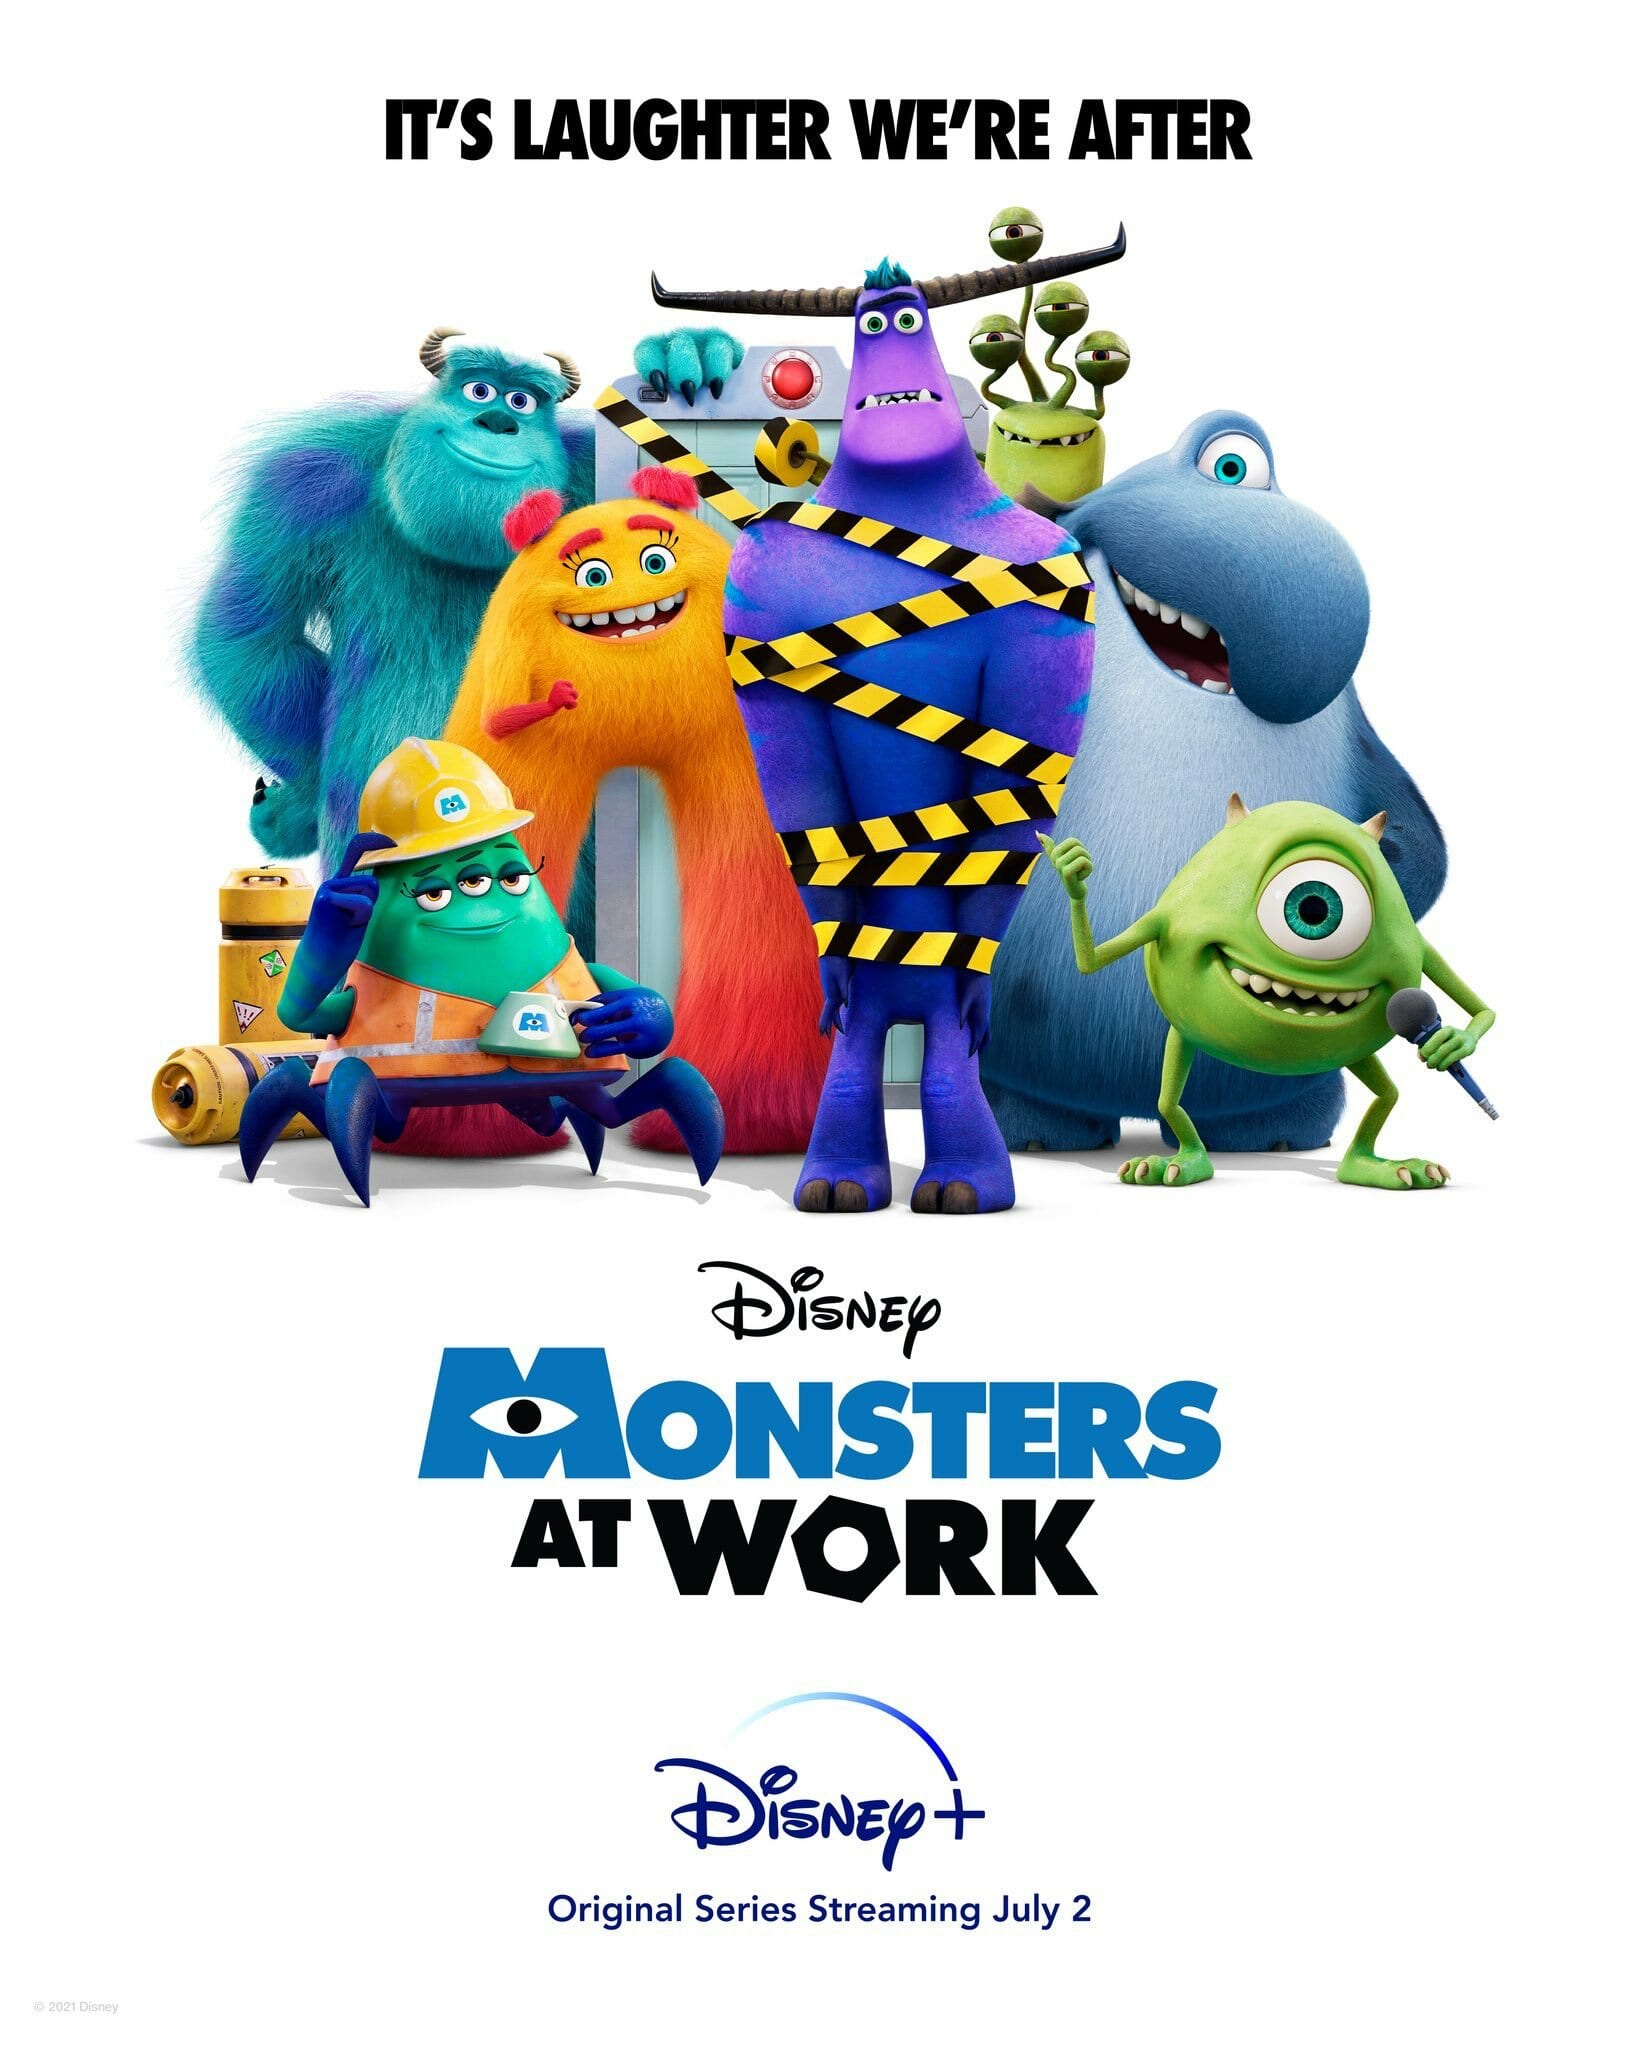 Monsters at Work teaser image